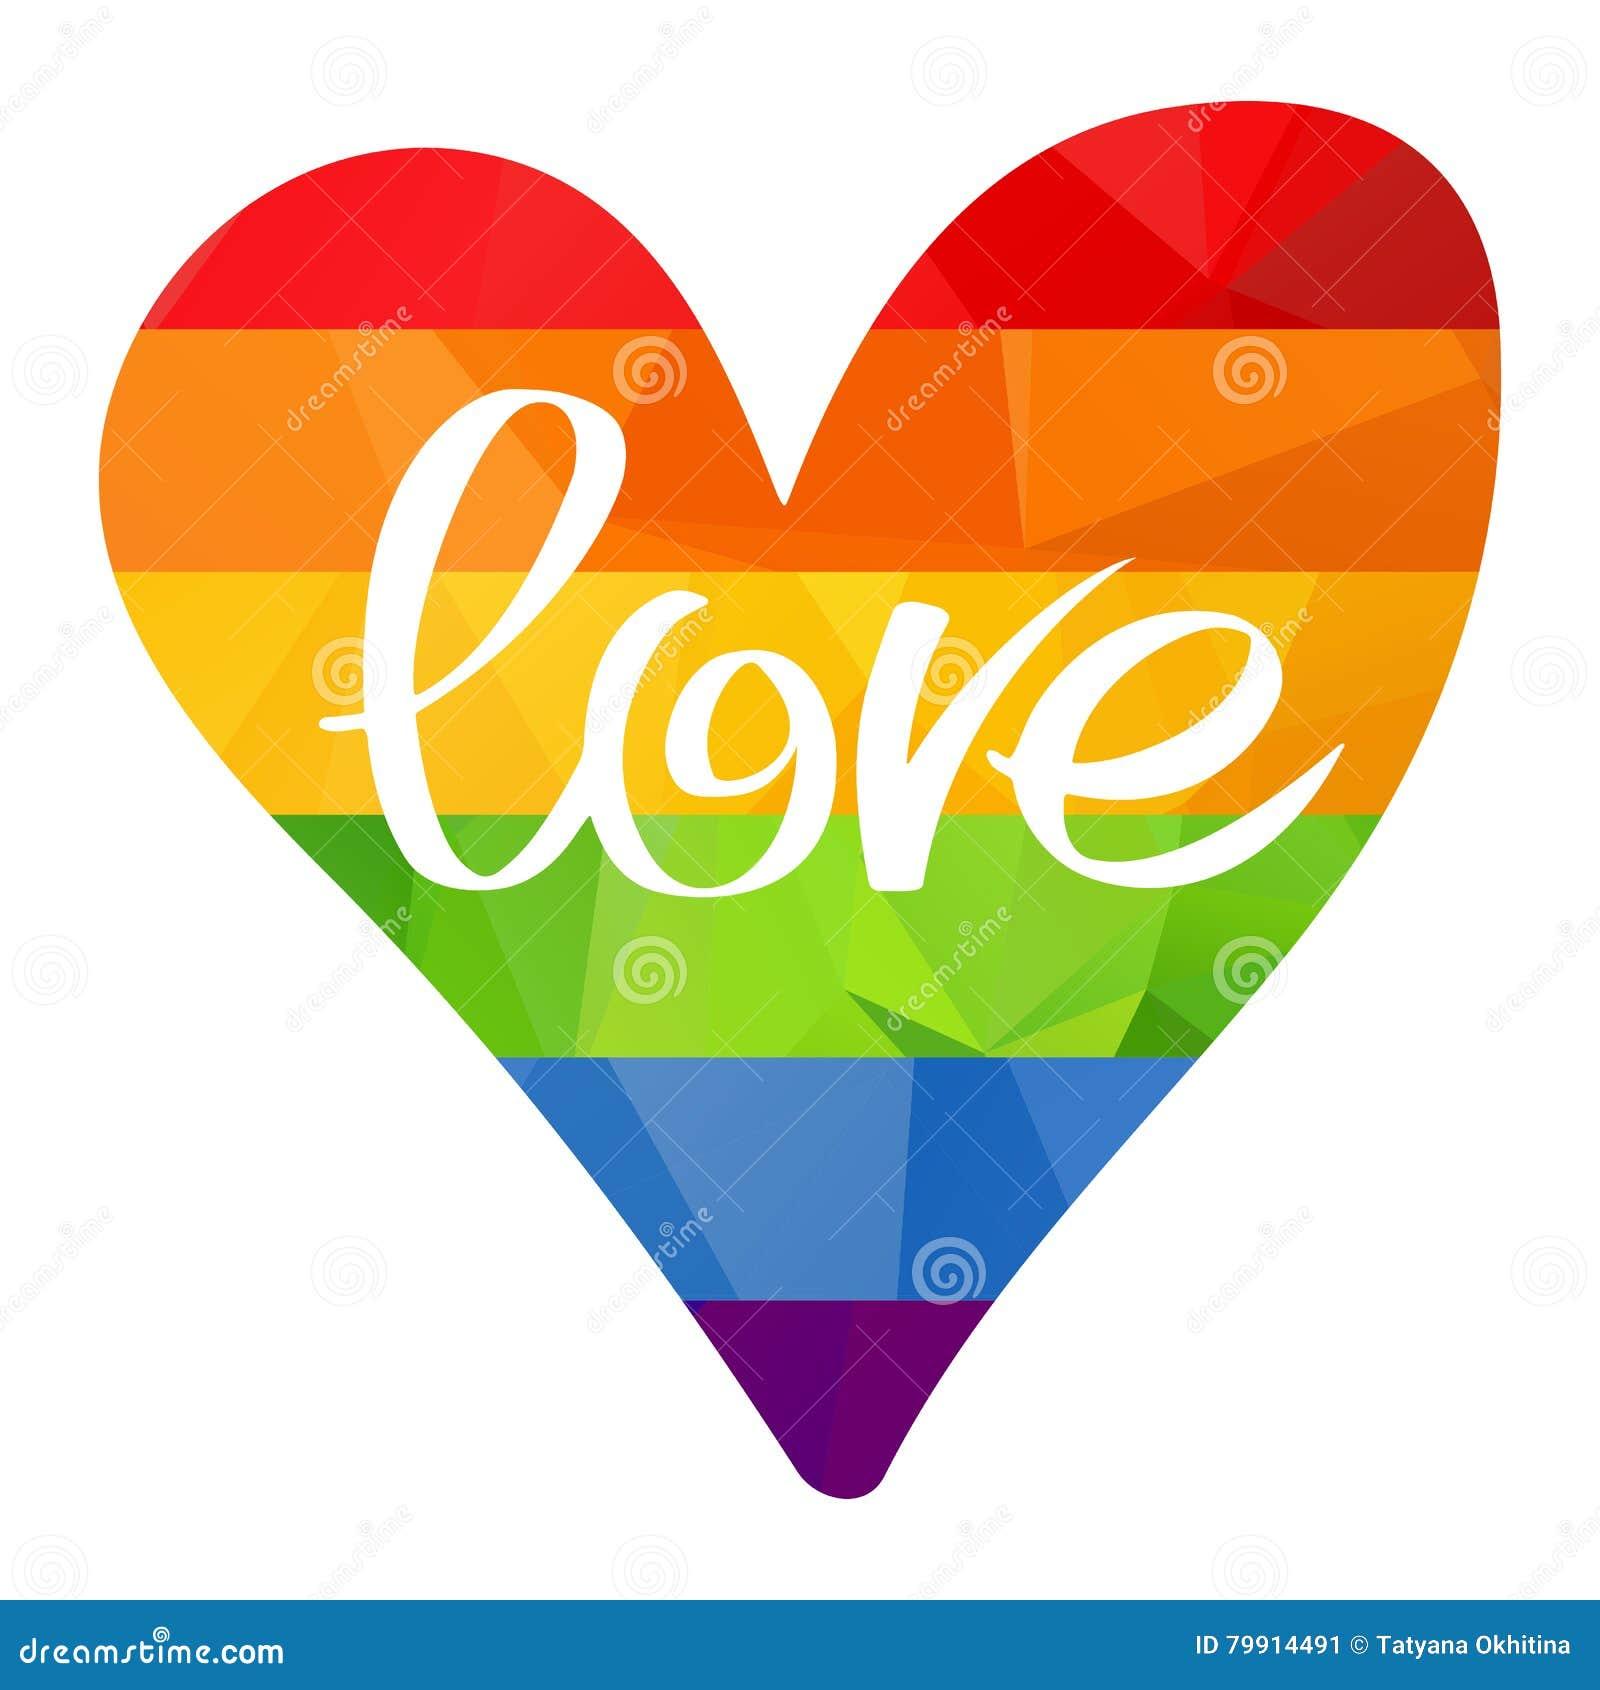 Homosexual seacoast church accepts